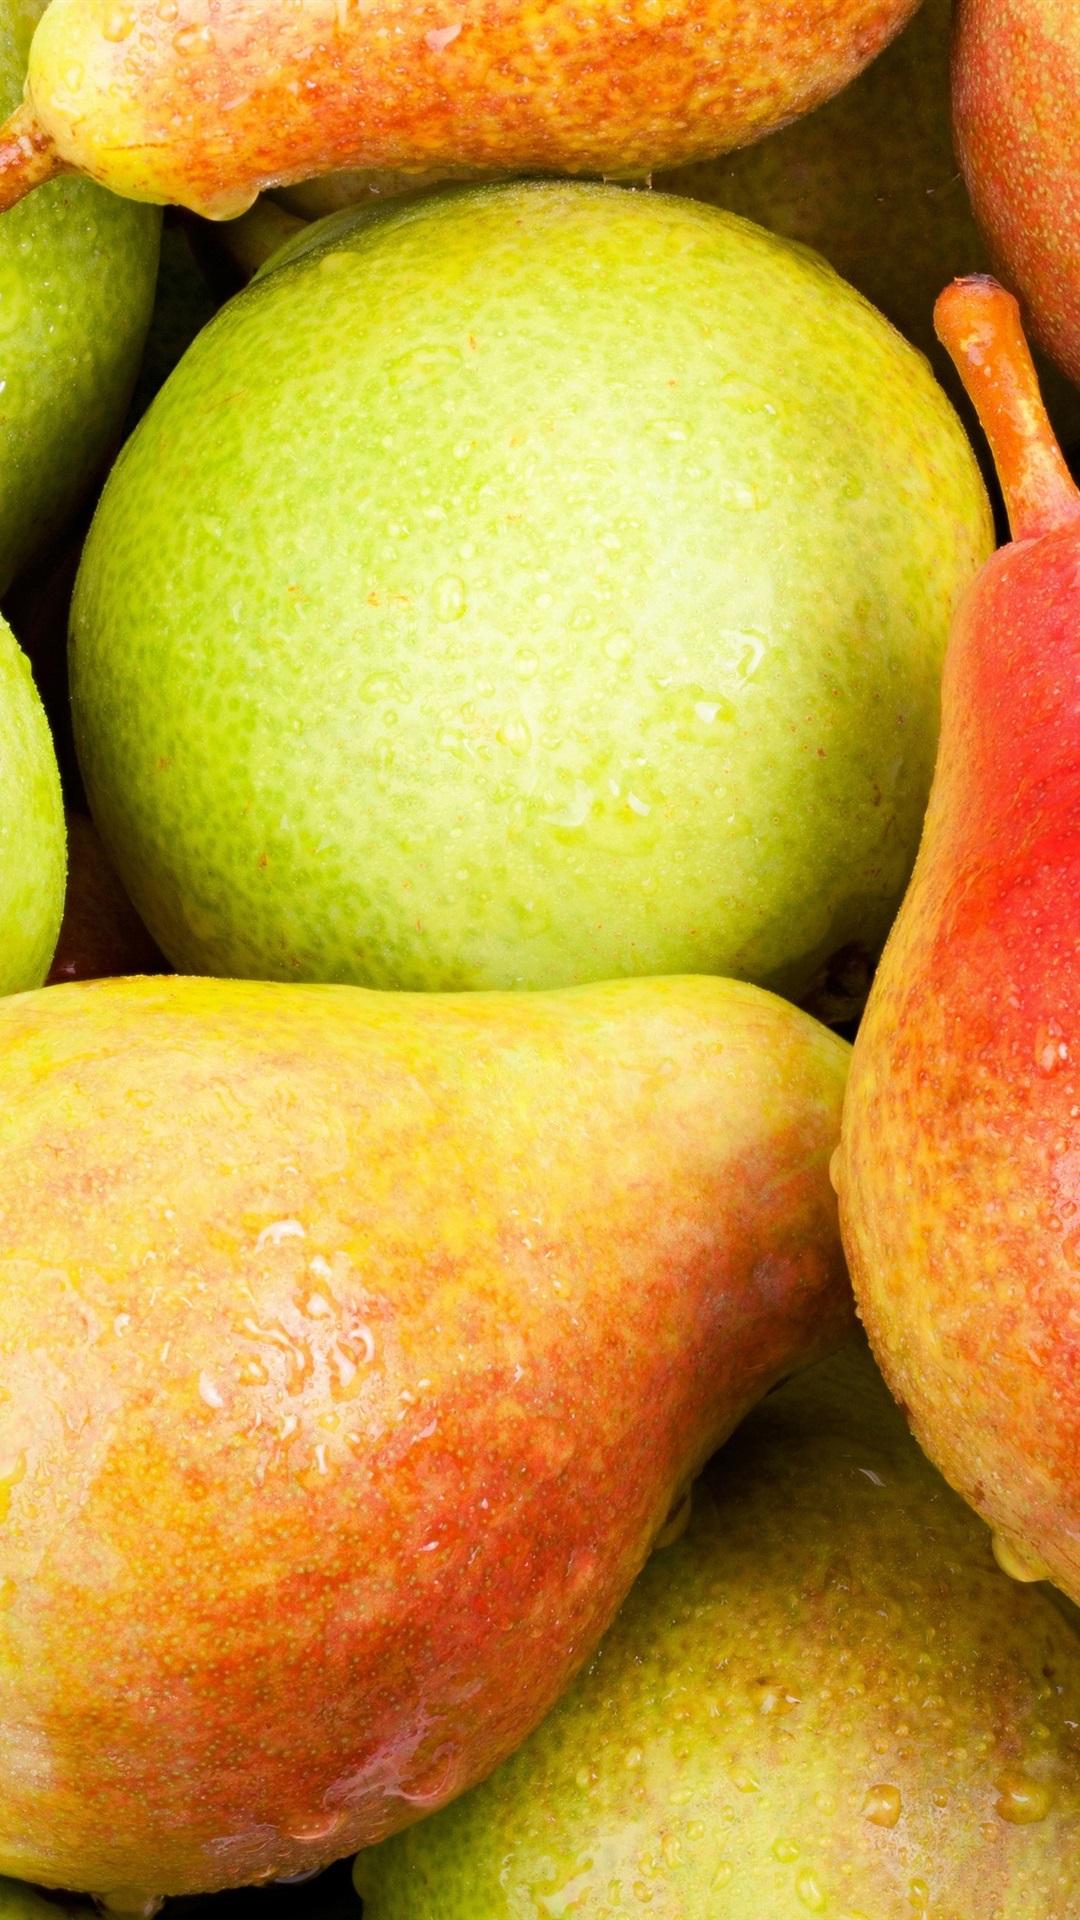 Fresh Pears Sweet Fruit Water Drops 1080x1920 Iphone 8 7 6